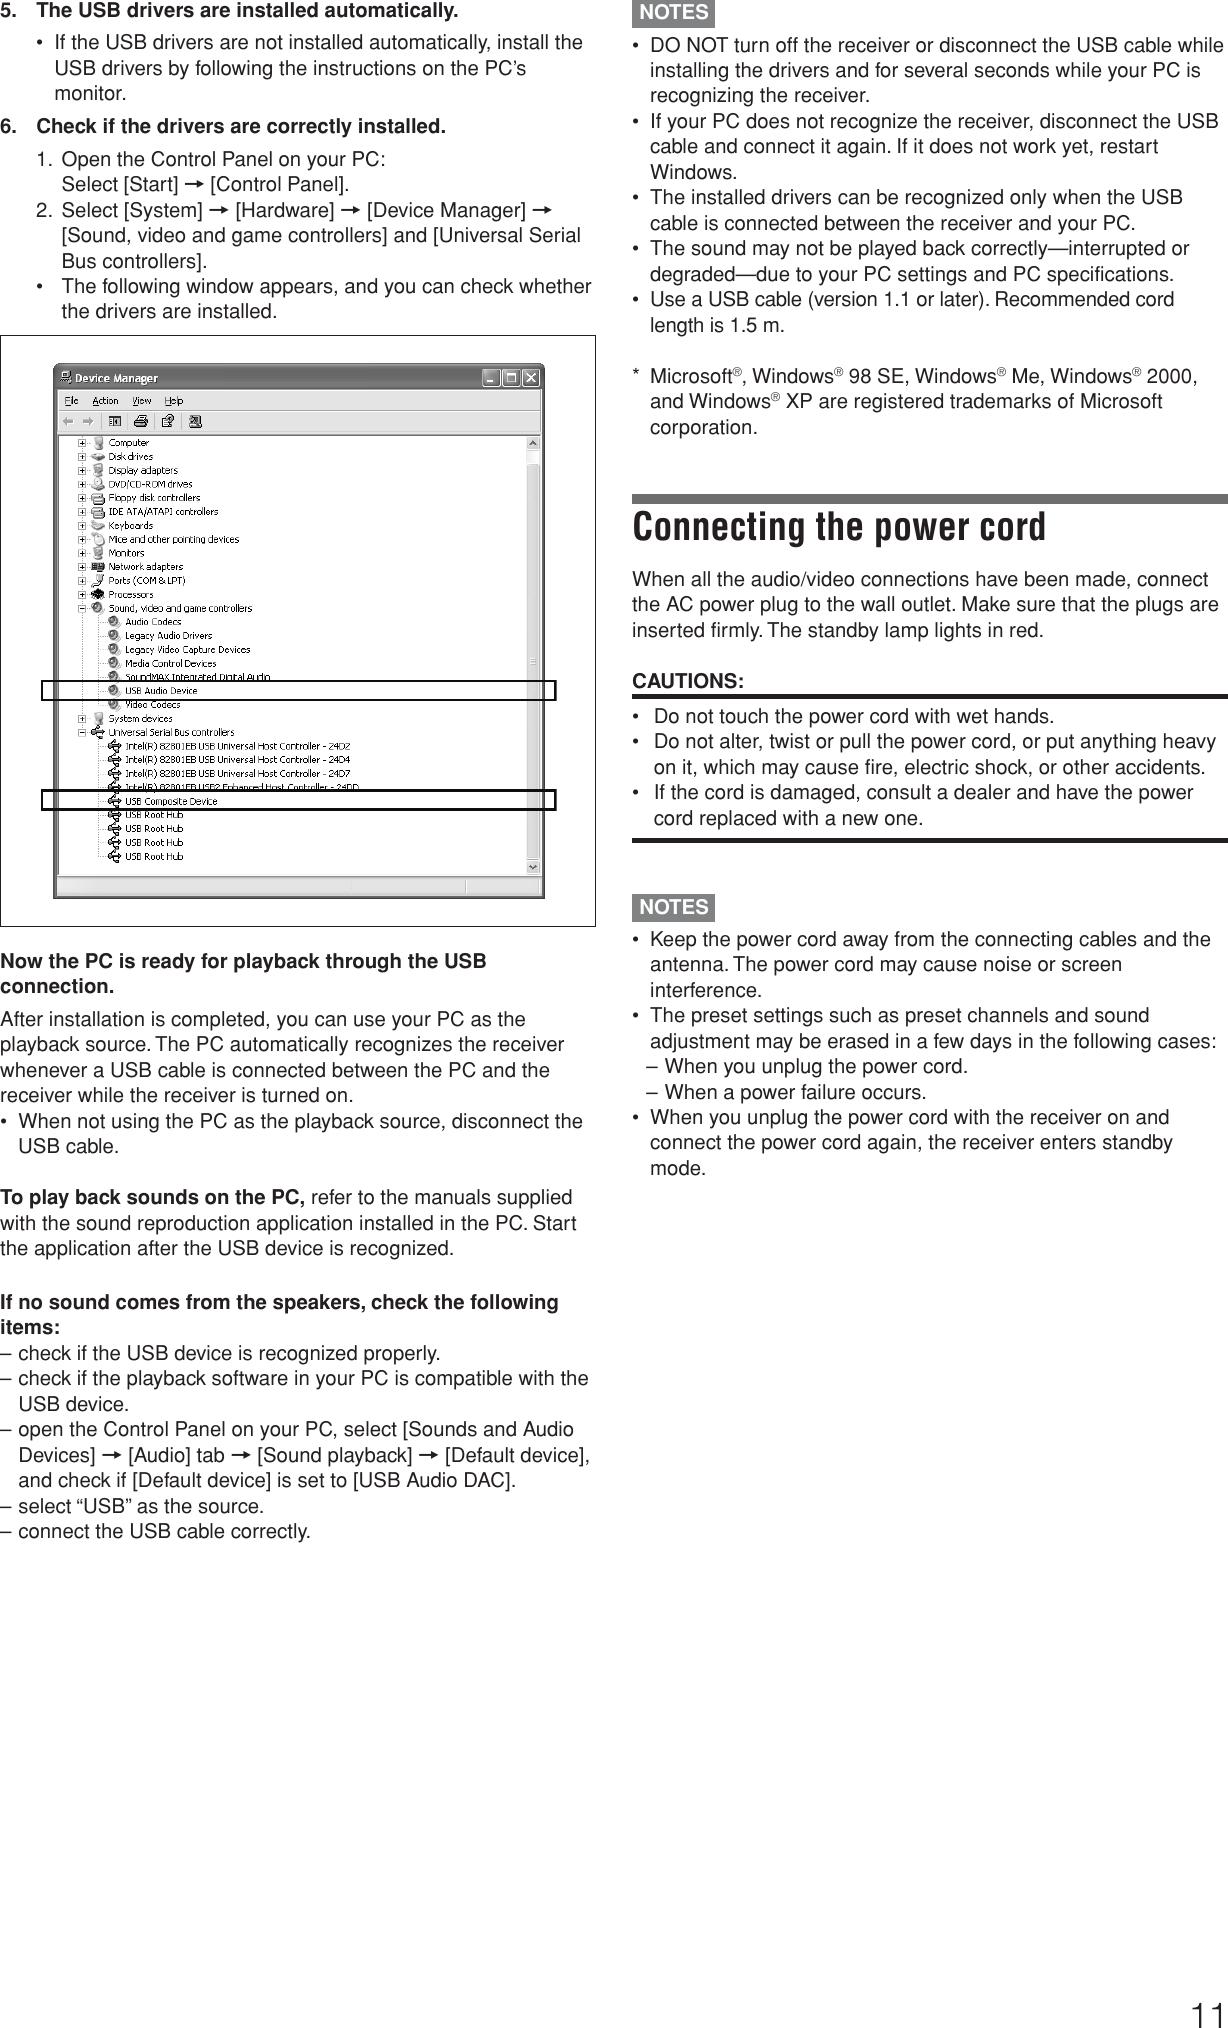 Jvc Stereo Receiver Rx D205S Users Manual D205S/D206B[J]